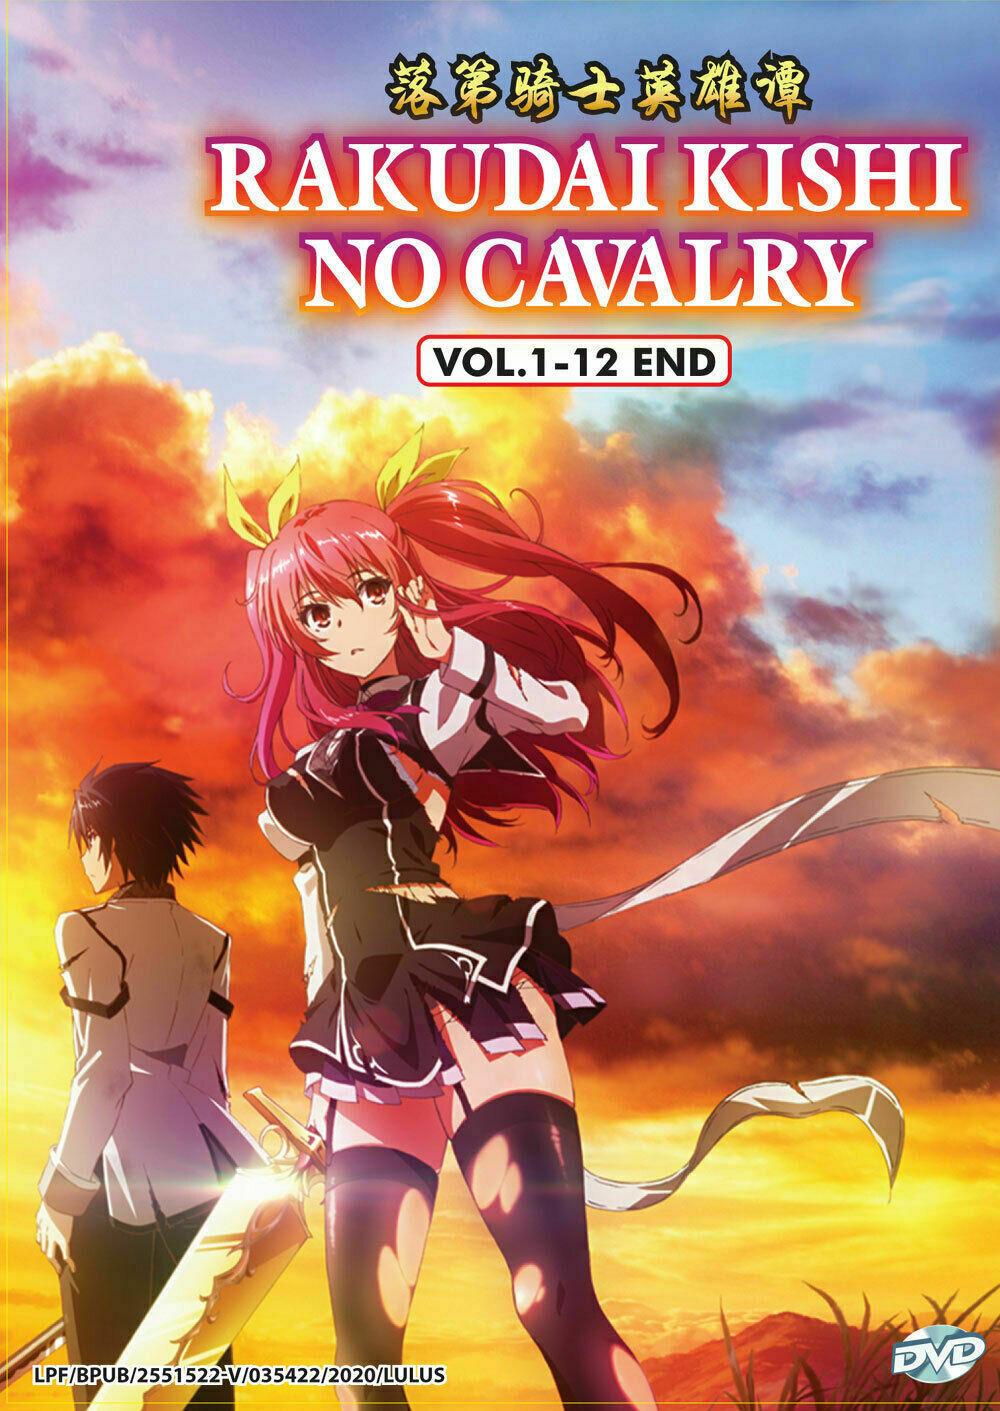 Rakudai Kishi No Cavalry Vol.1-12 end English Dubbed DVD ship From USA